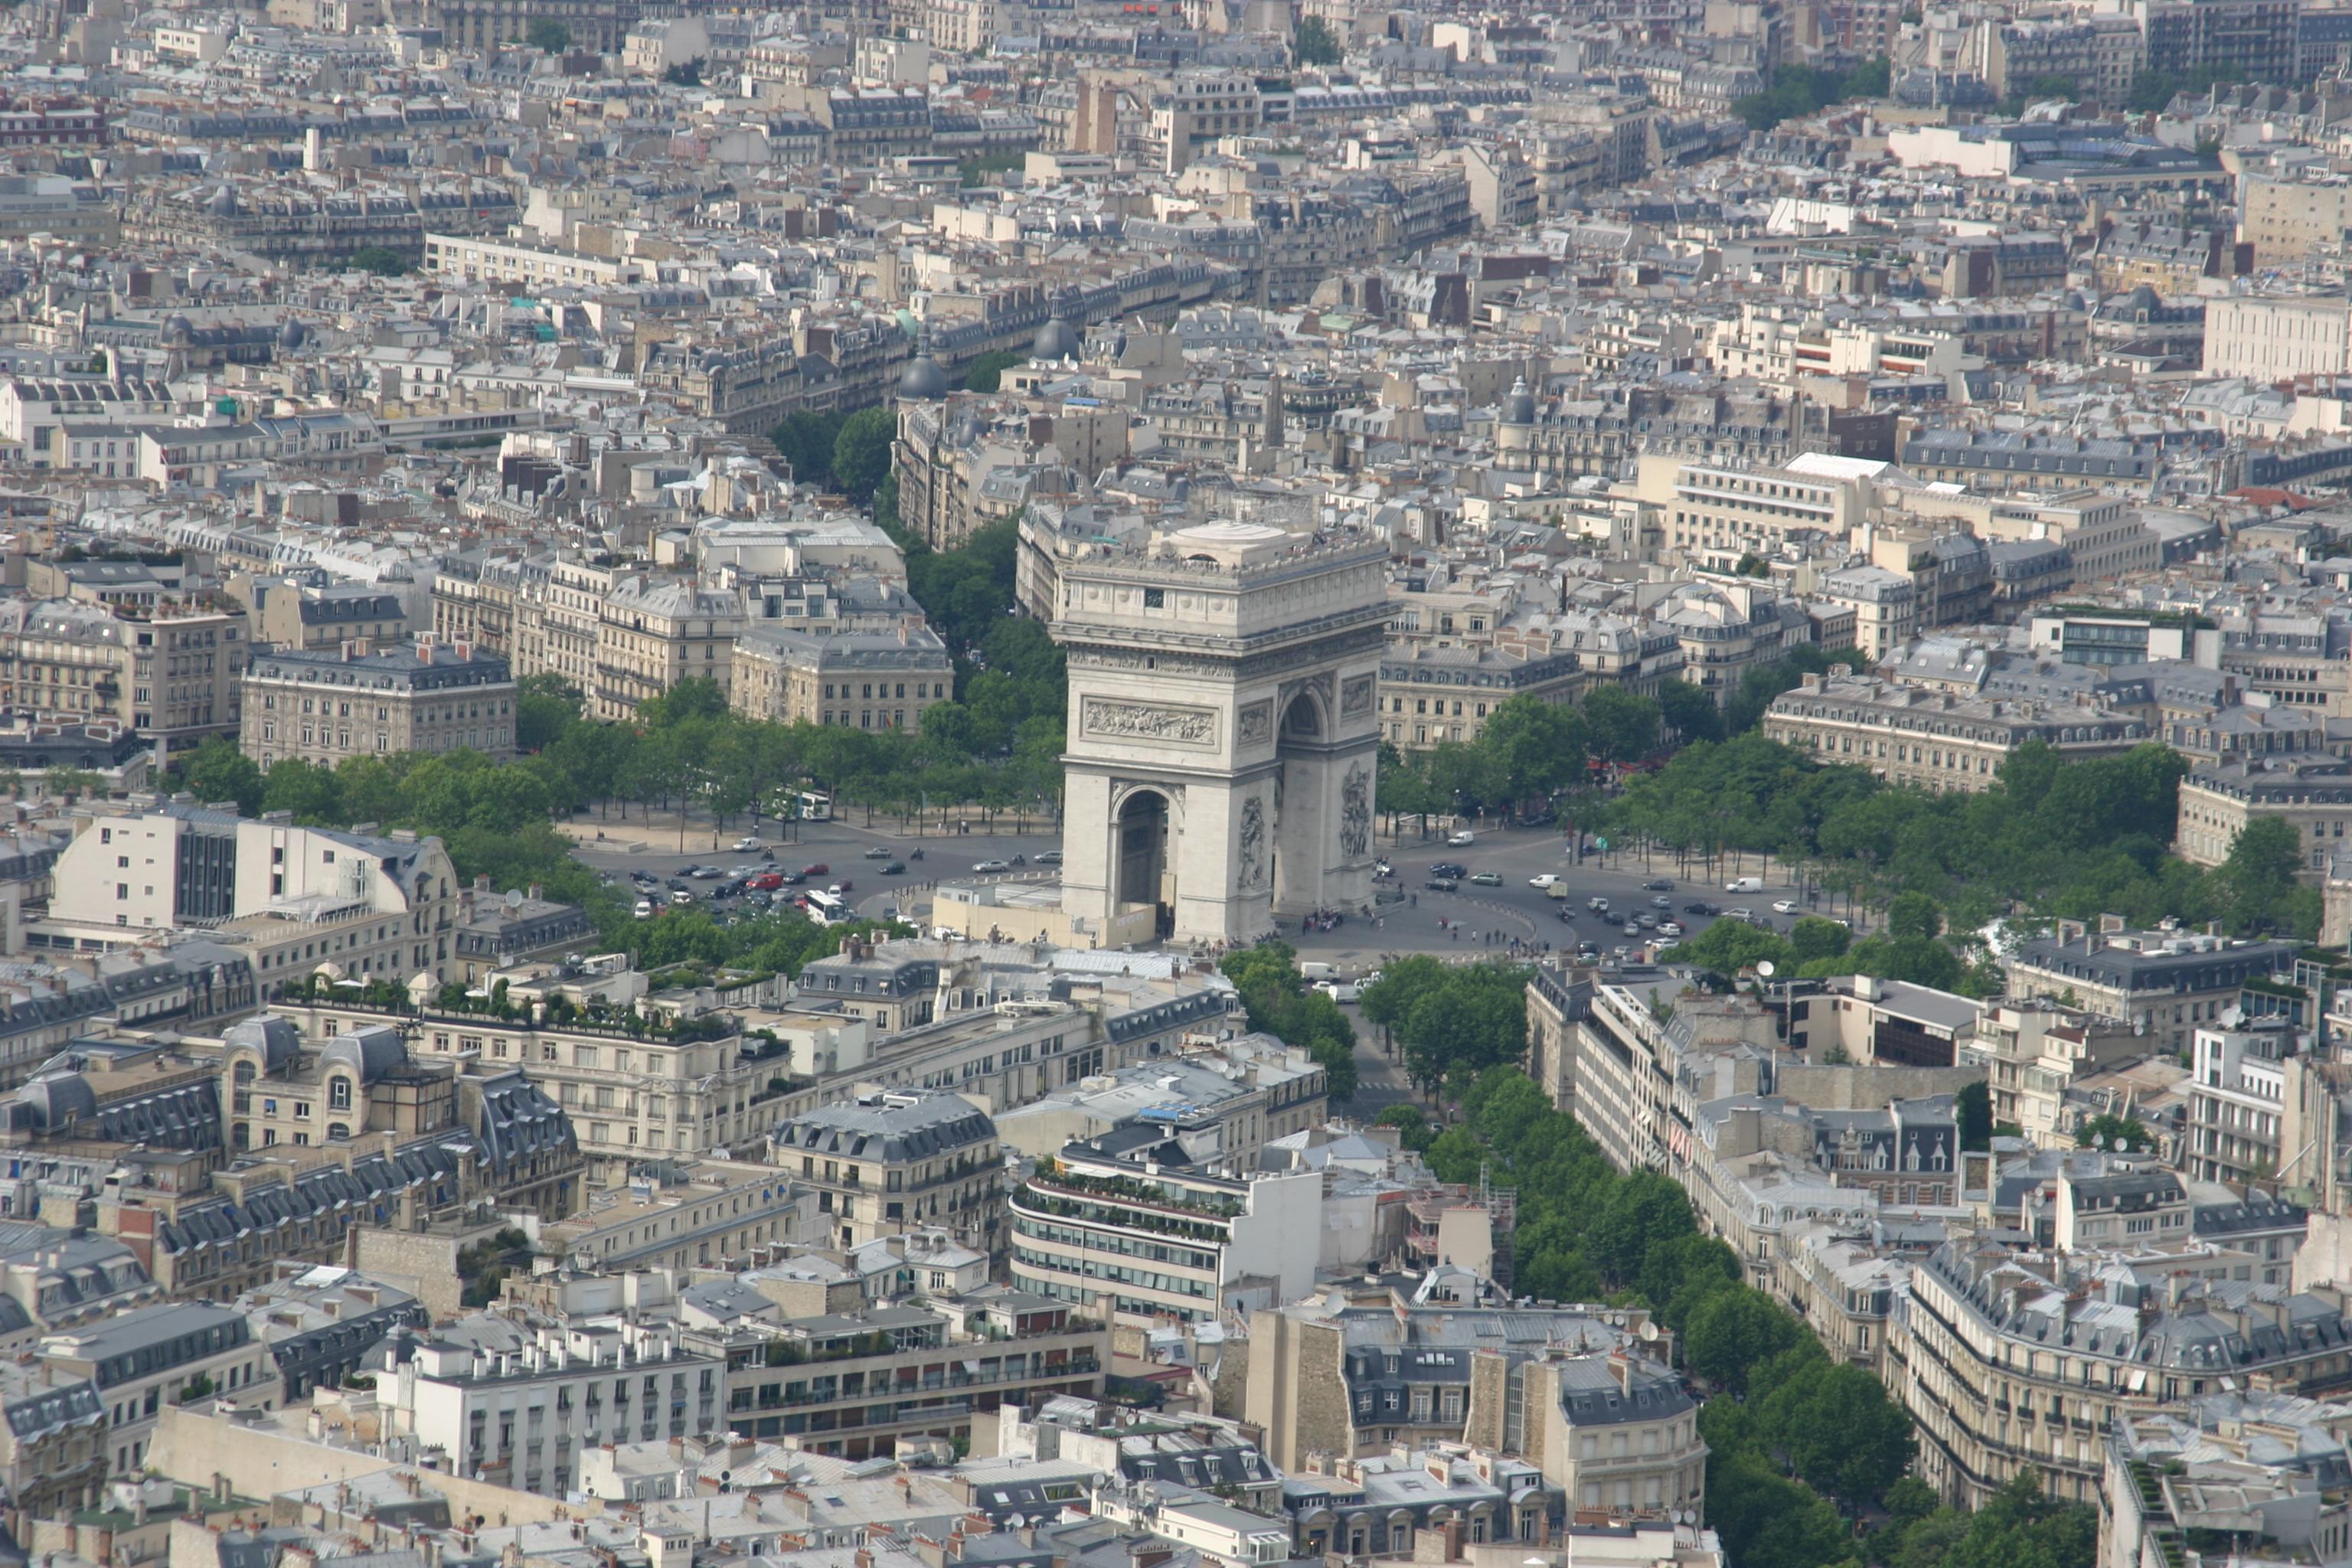 File:Tour Eiffel Arc de Triomphe.JPG - Wikimedia Commons